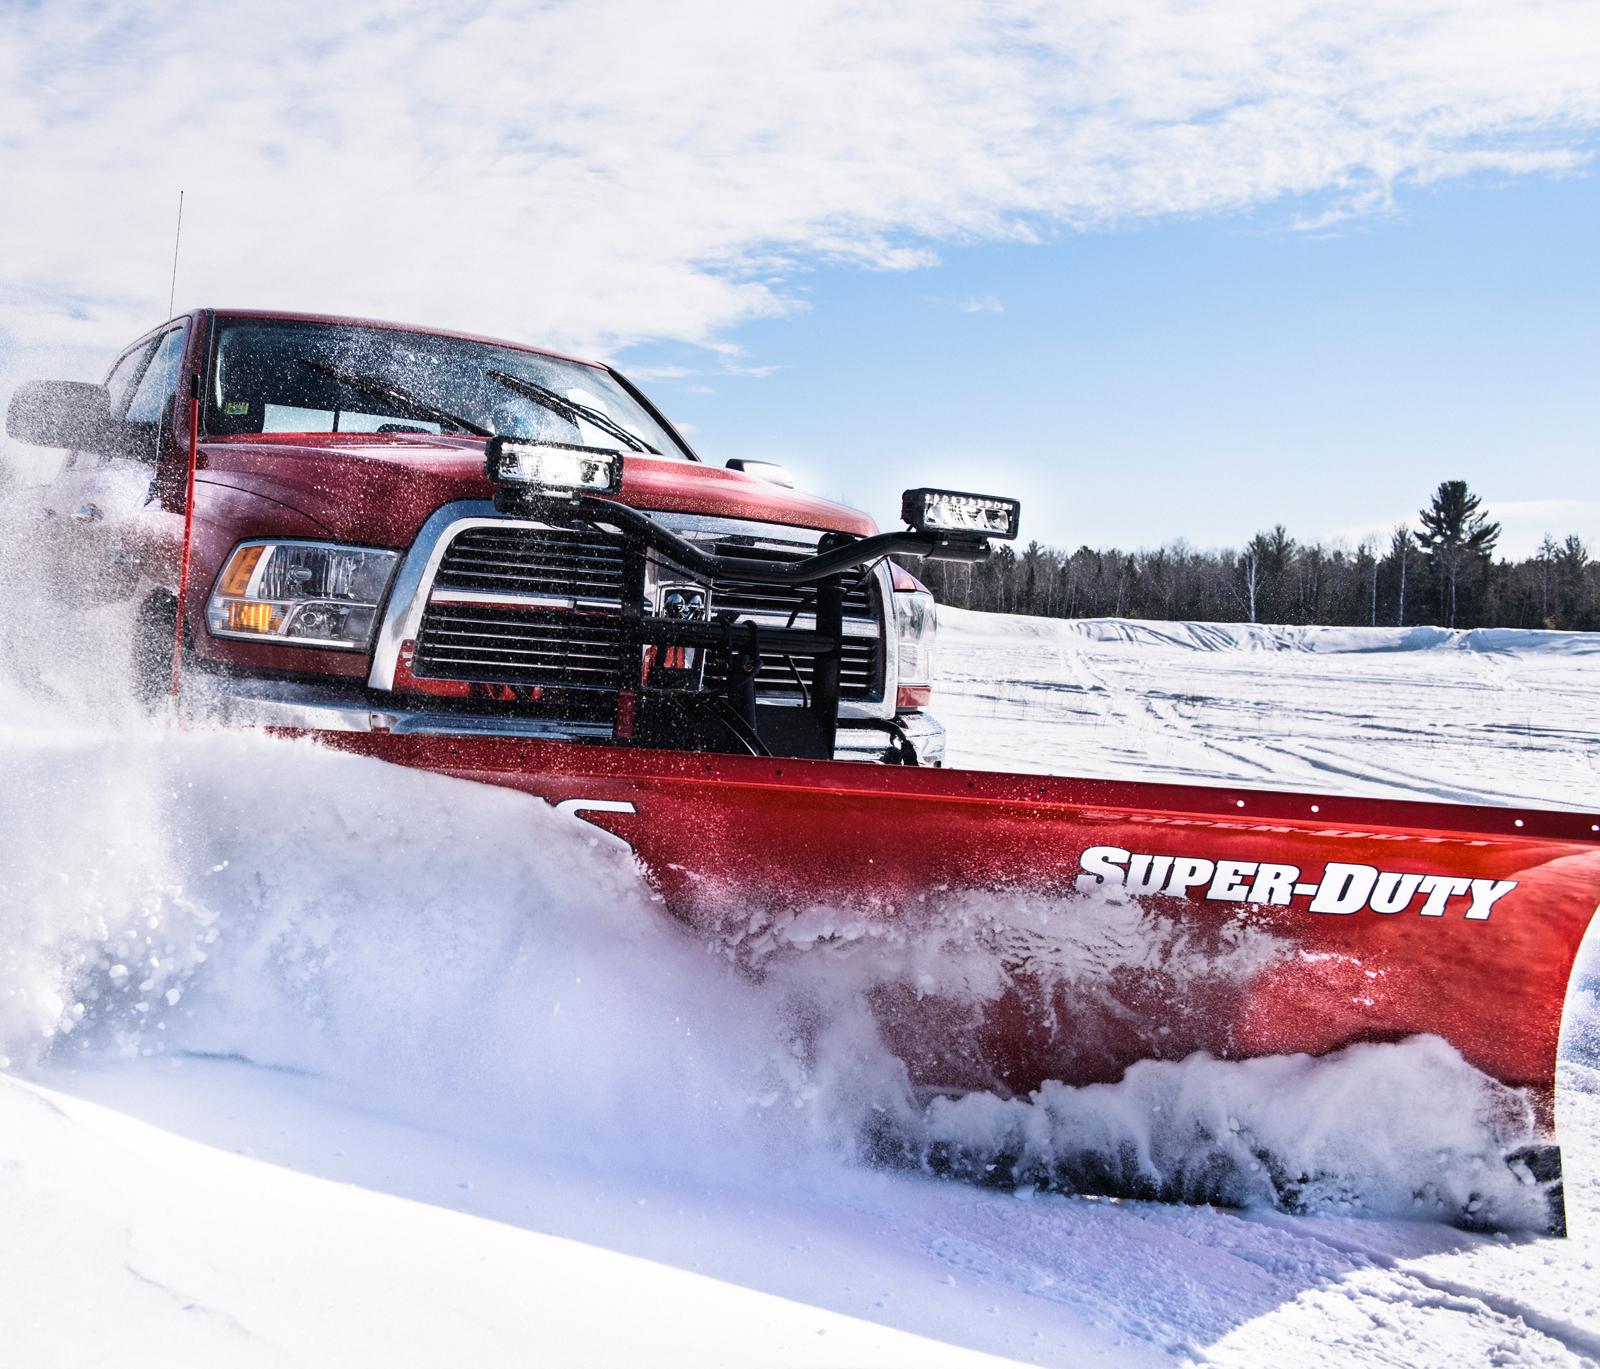 hight resolution of super duty plows boss snowplowboss snow plow wiring 02 chevy truck 17